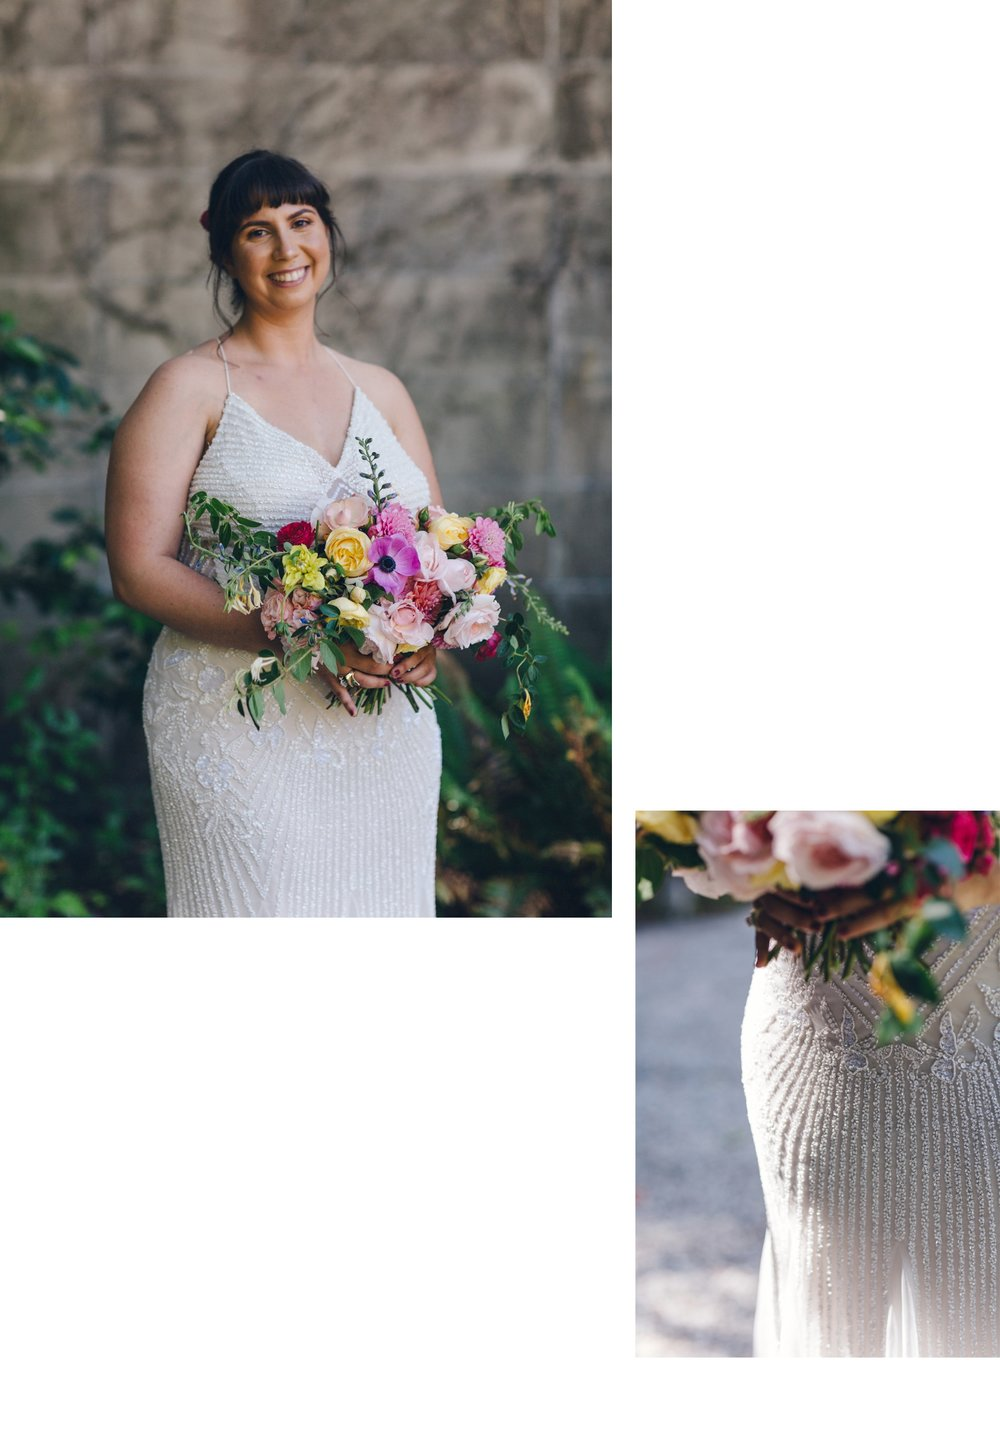 IG_wedding (11 of 110) copy.jpg